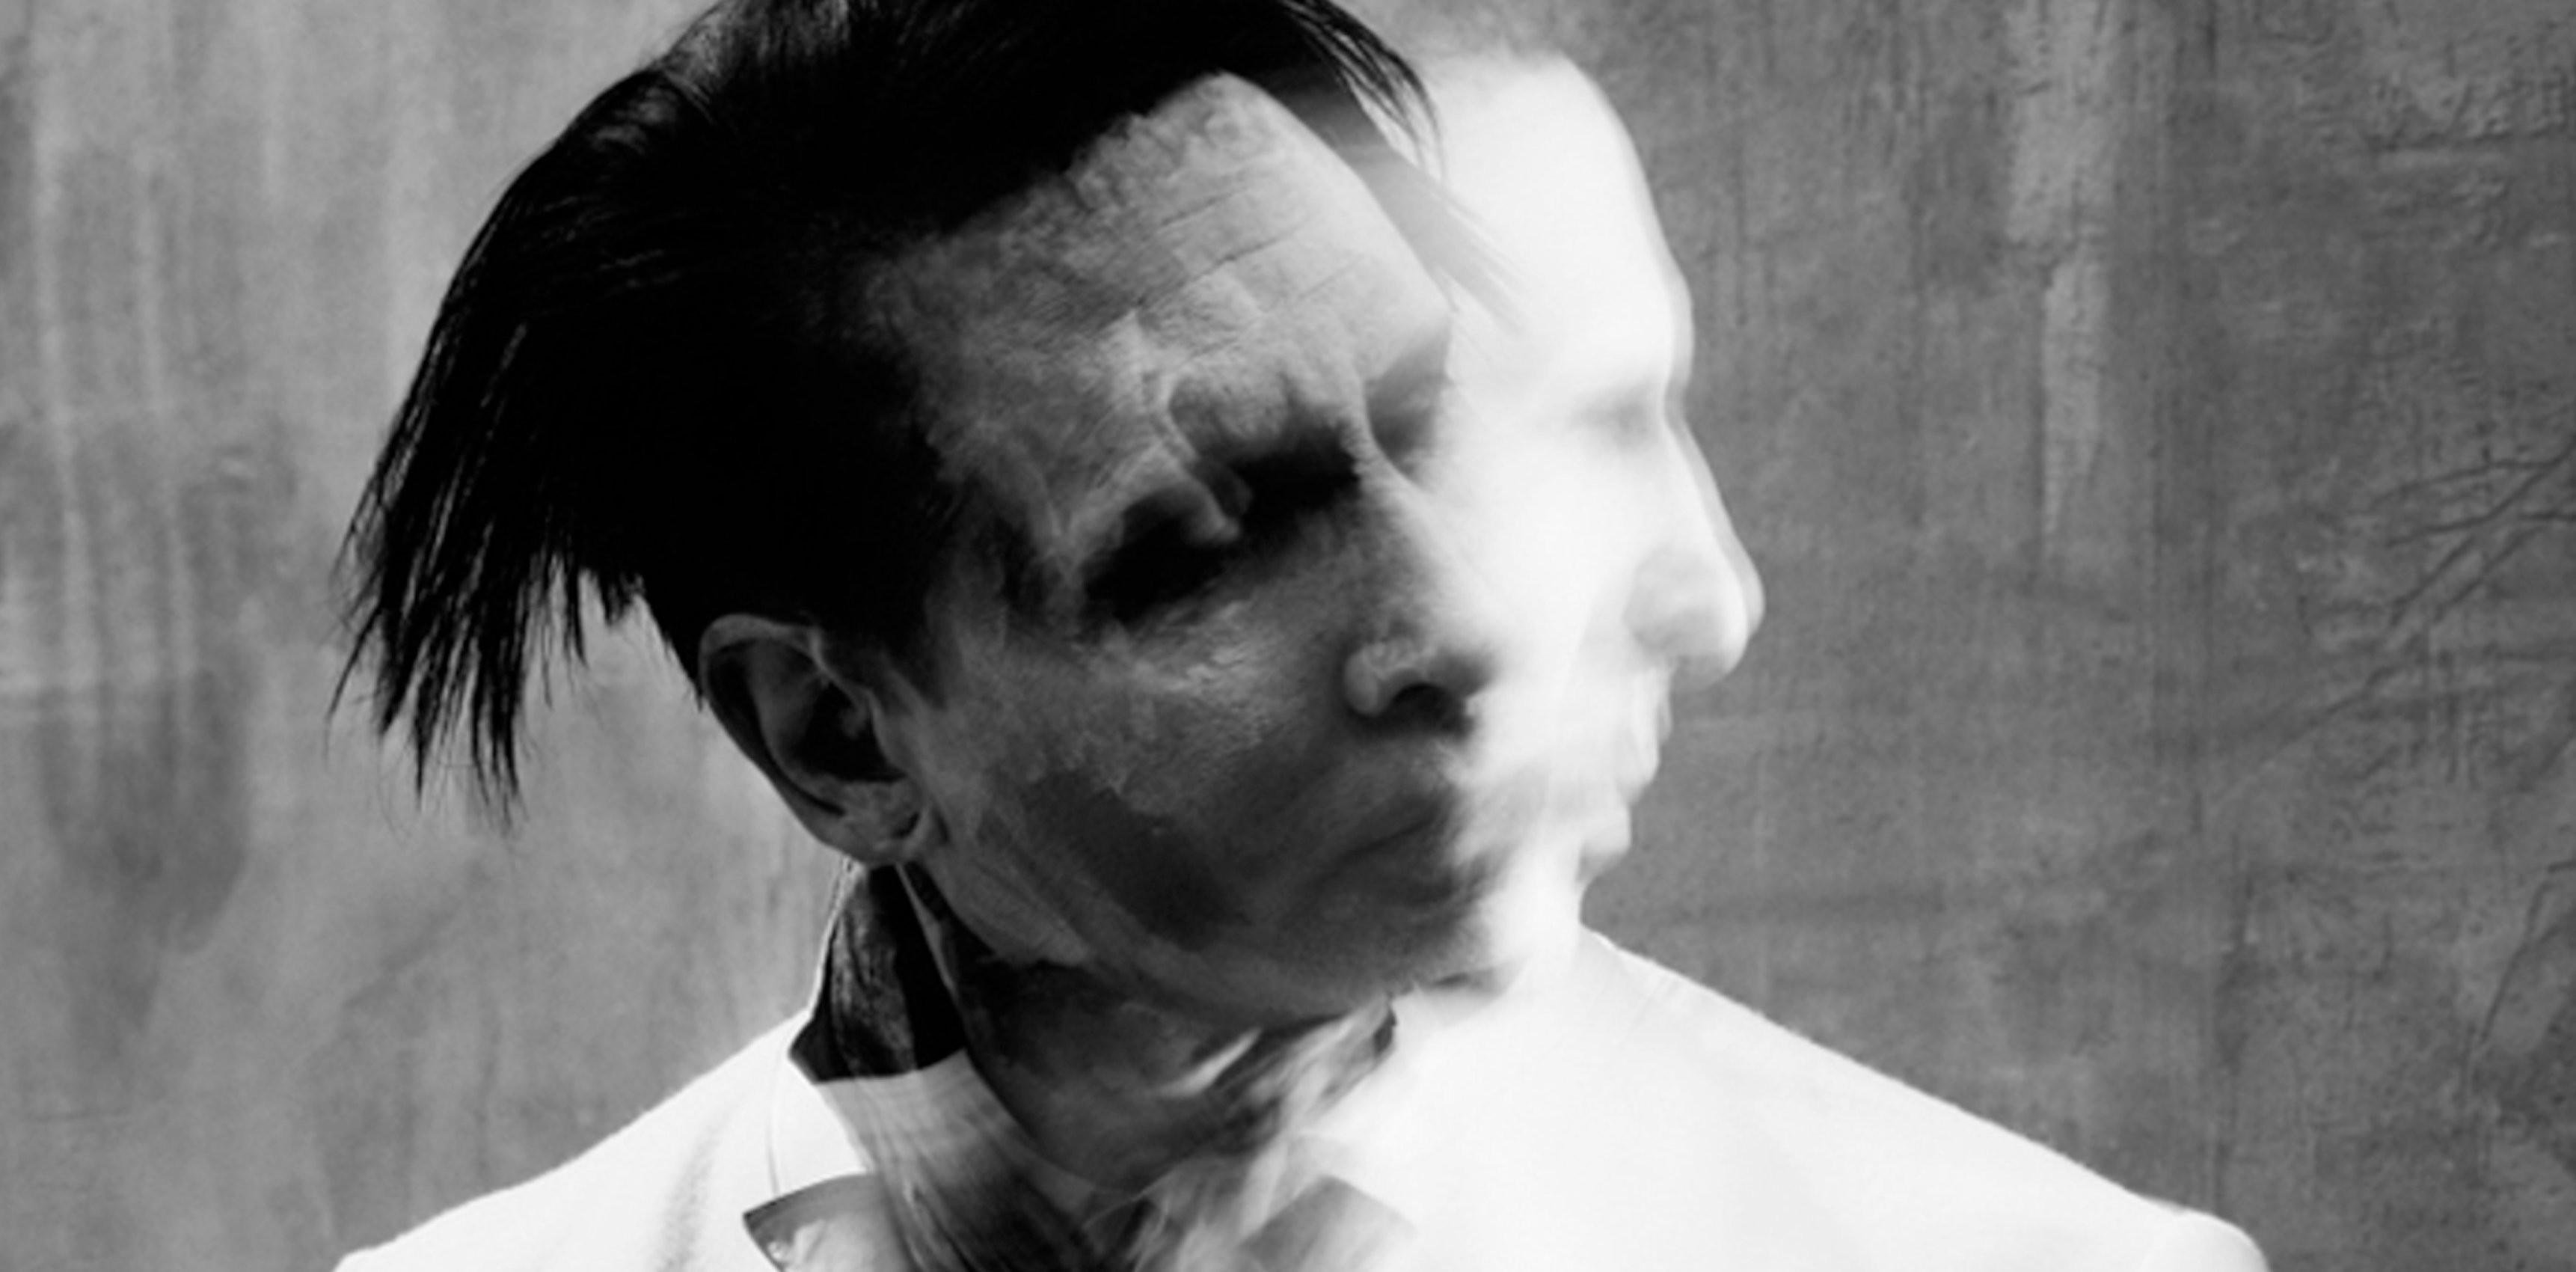 Marilyn Manson Industrial Metal Heavy Glam Shock Hard Rock Wallpaper At  Dark Wallpapers